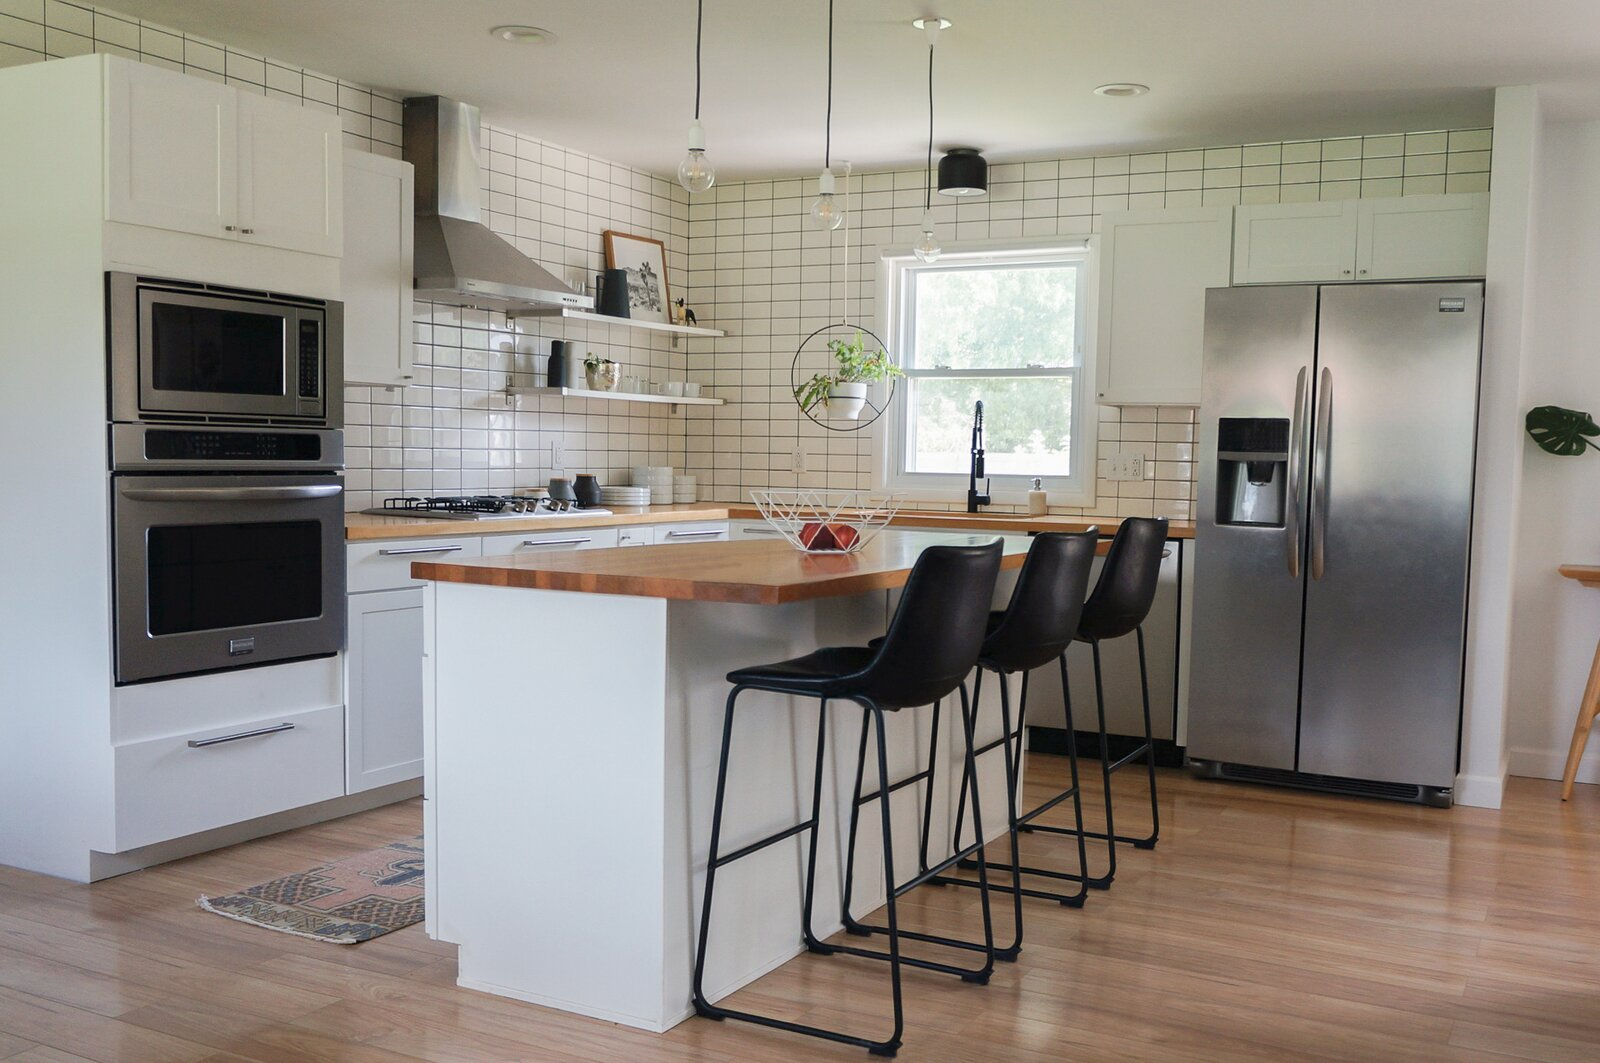 britdotdesign Kitchen Reno by britdotdesign_Before